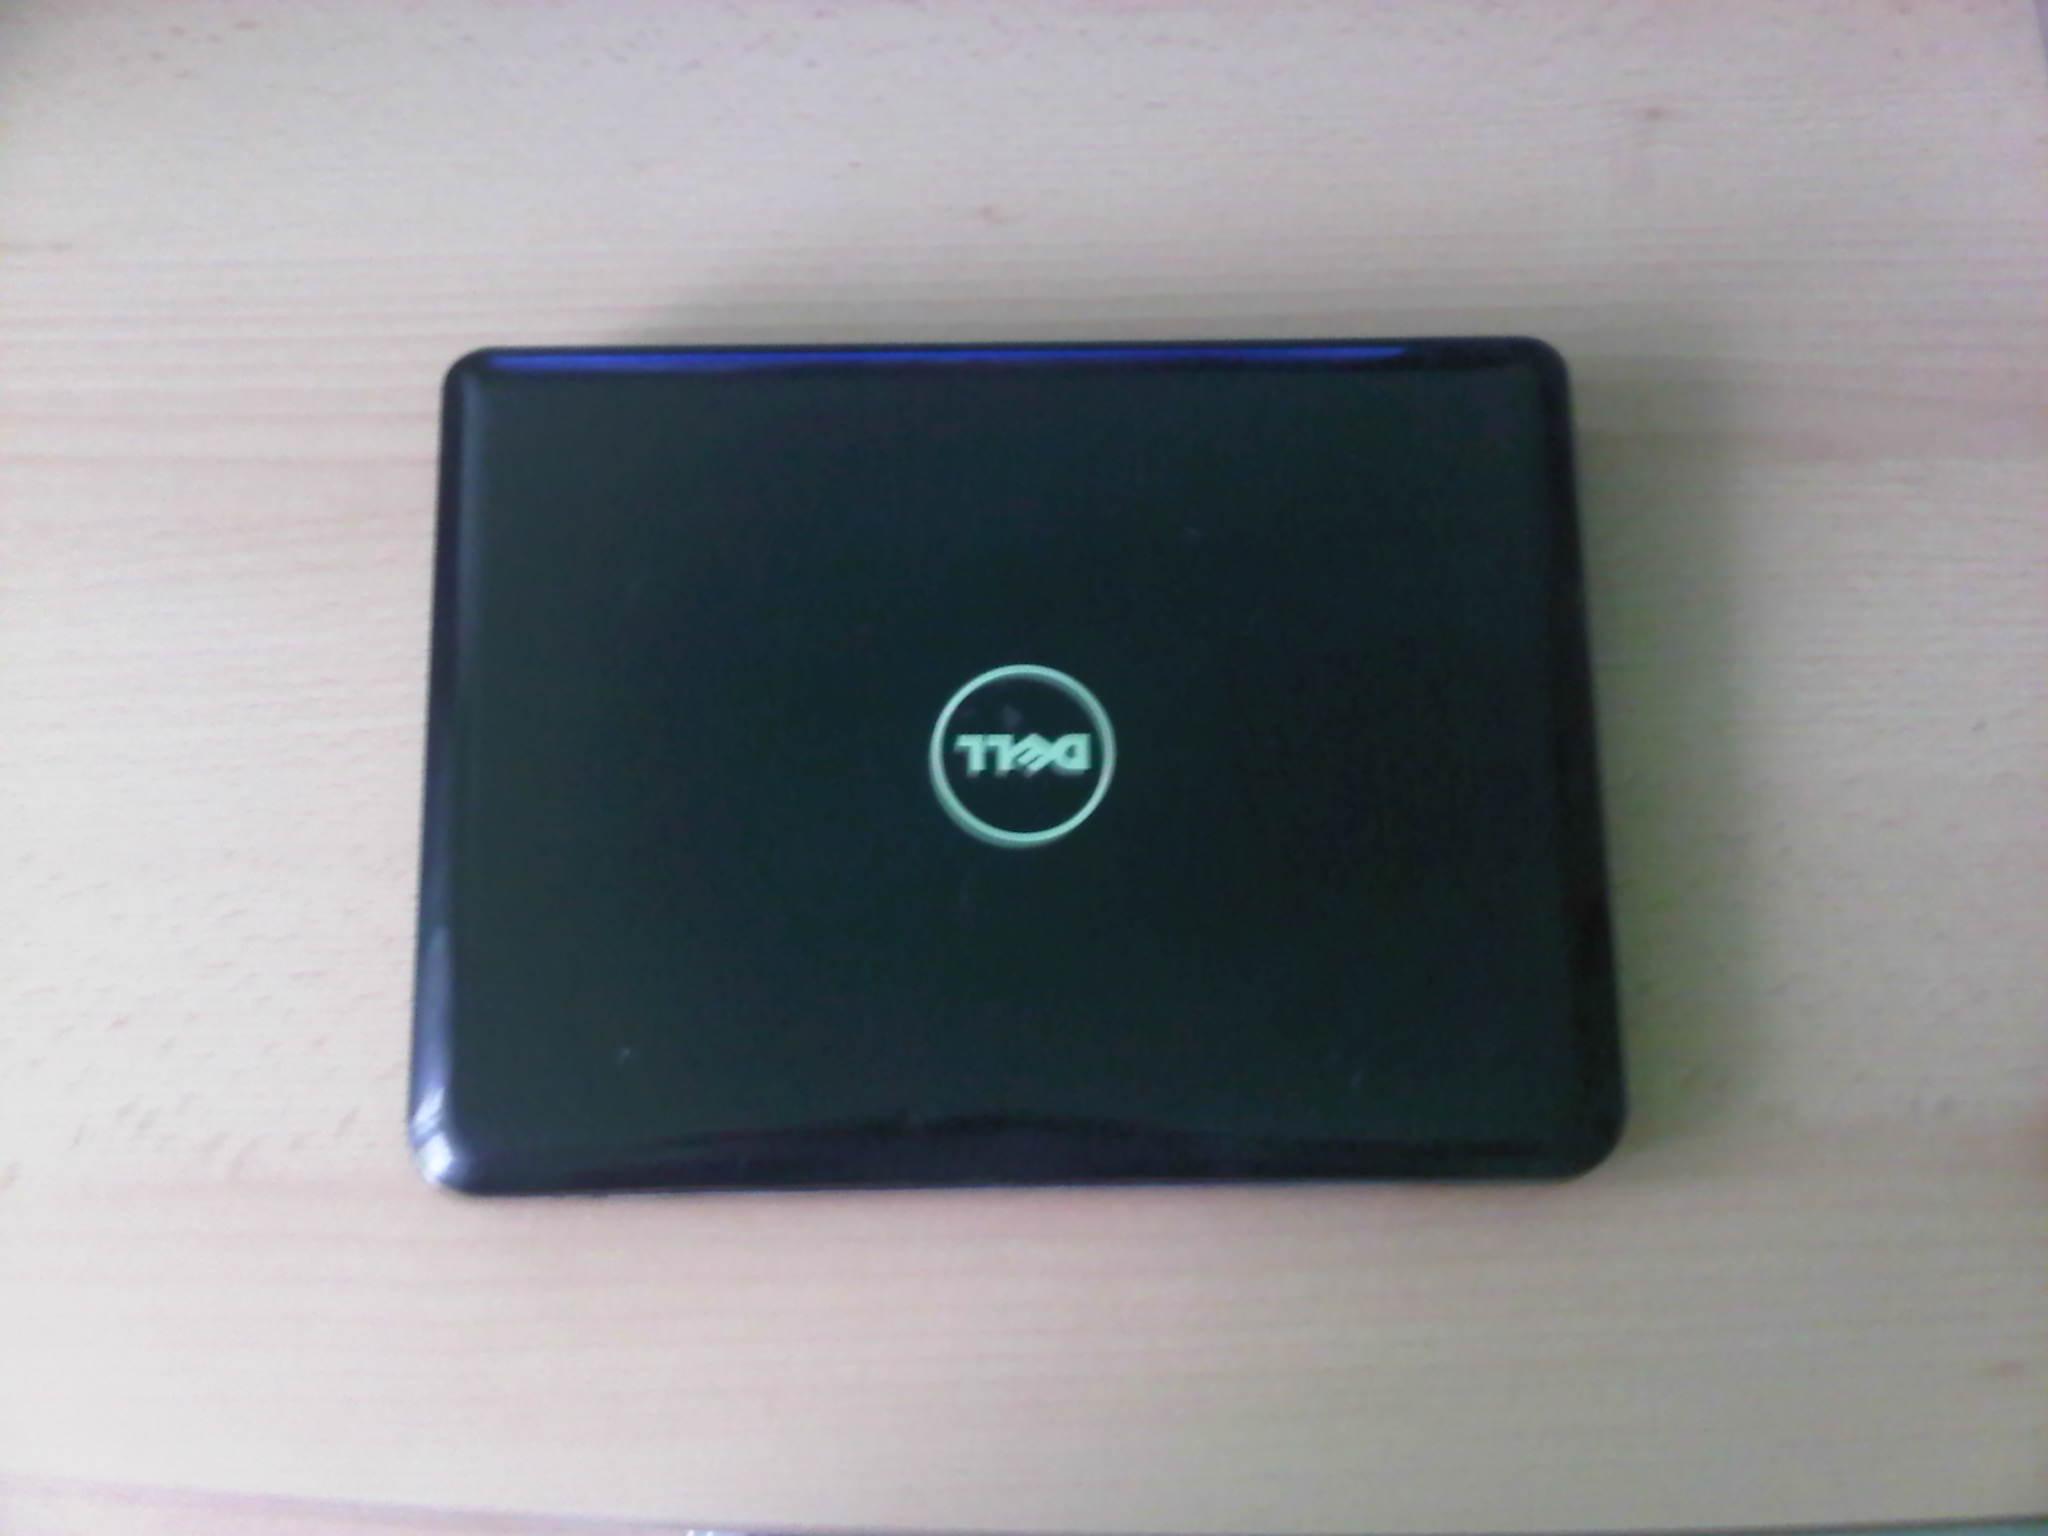 [Sprzedam] Sprzedam Dell Inspiron 910, TP - LINK TL-WN722N